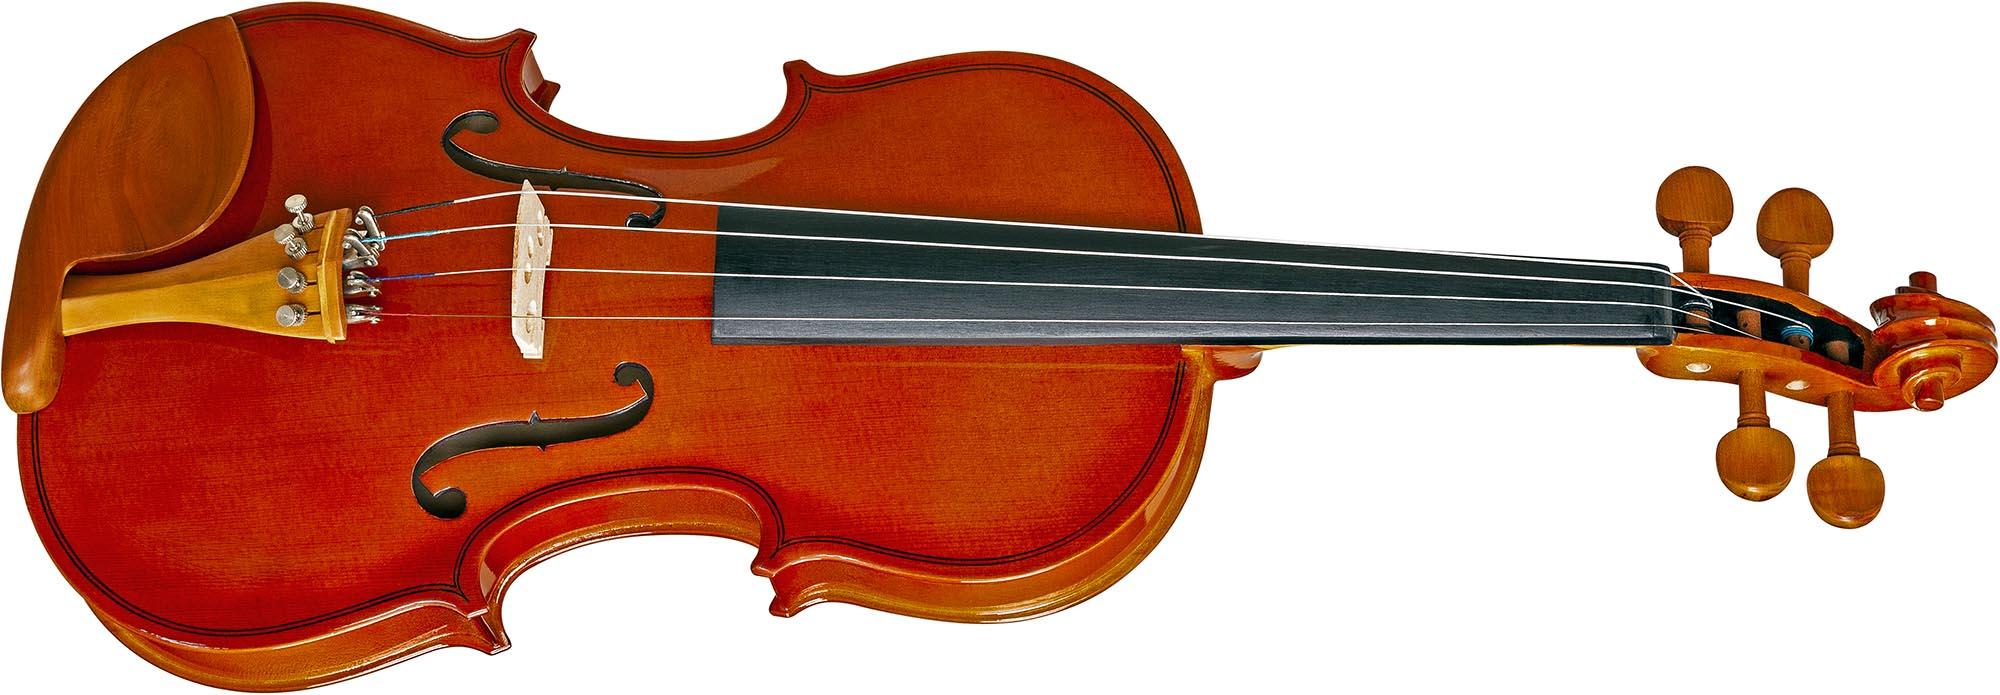 hve221 violino hofma hve221 visao frontal